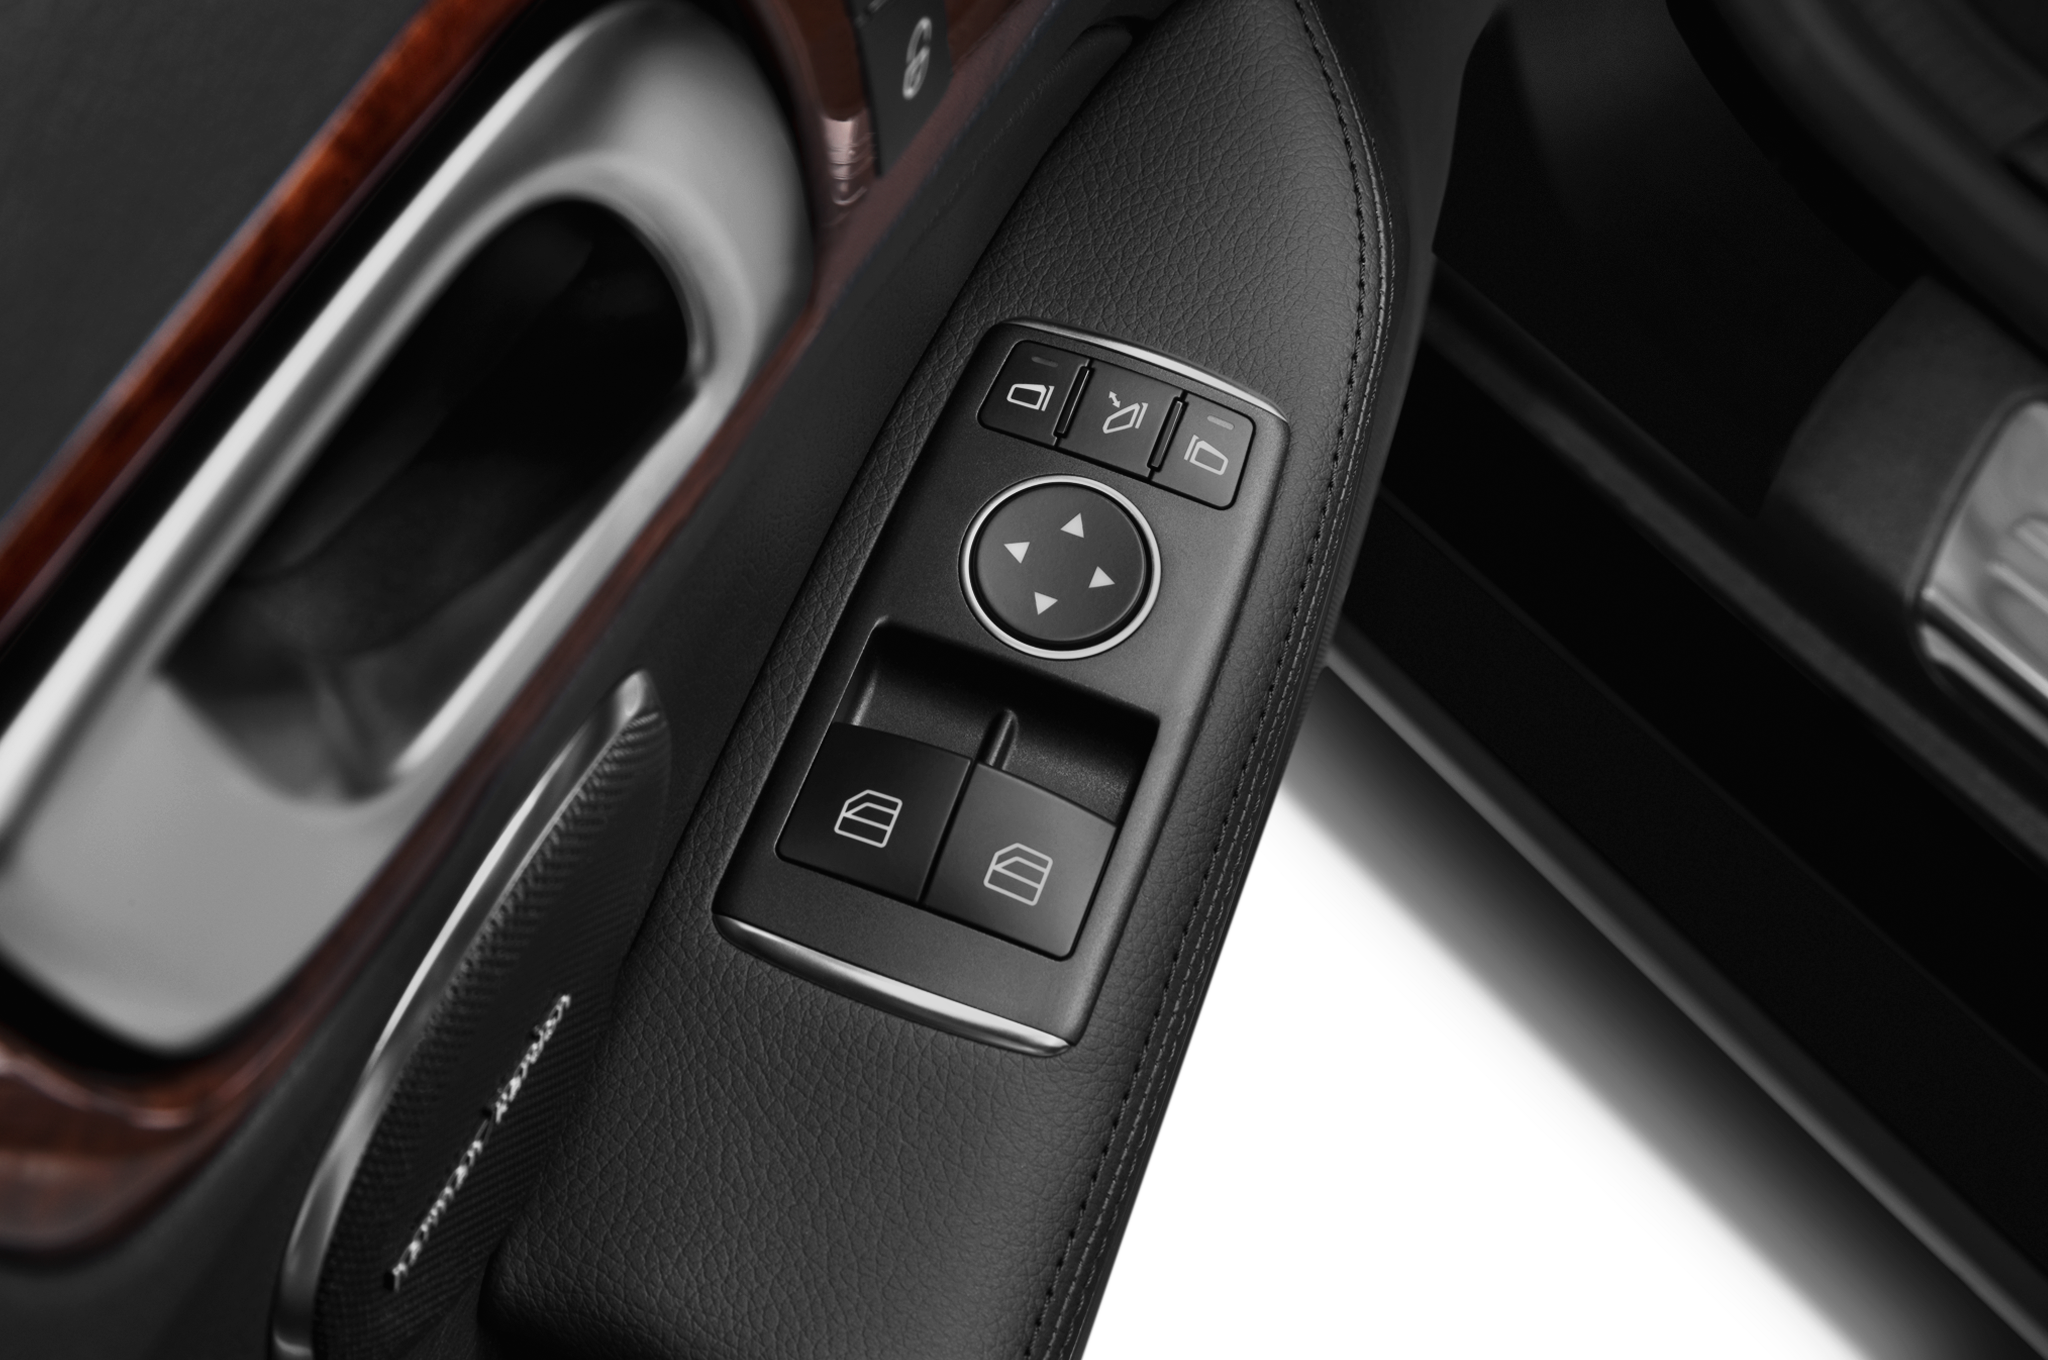 2012 Mercedes-Benz SLK250 - Editors' Notebook - Automobile Magazine